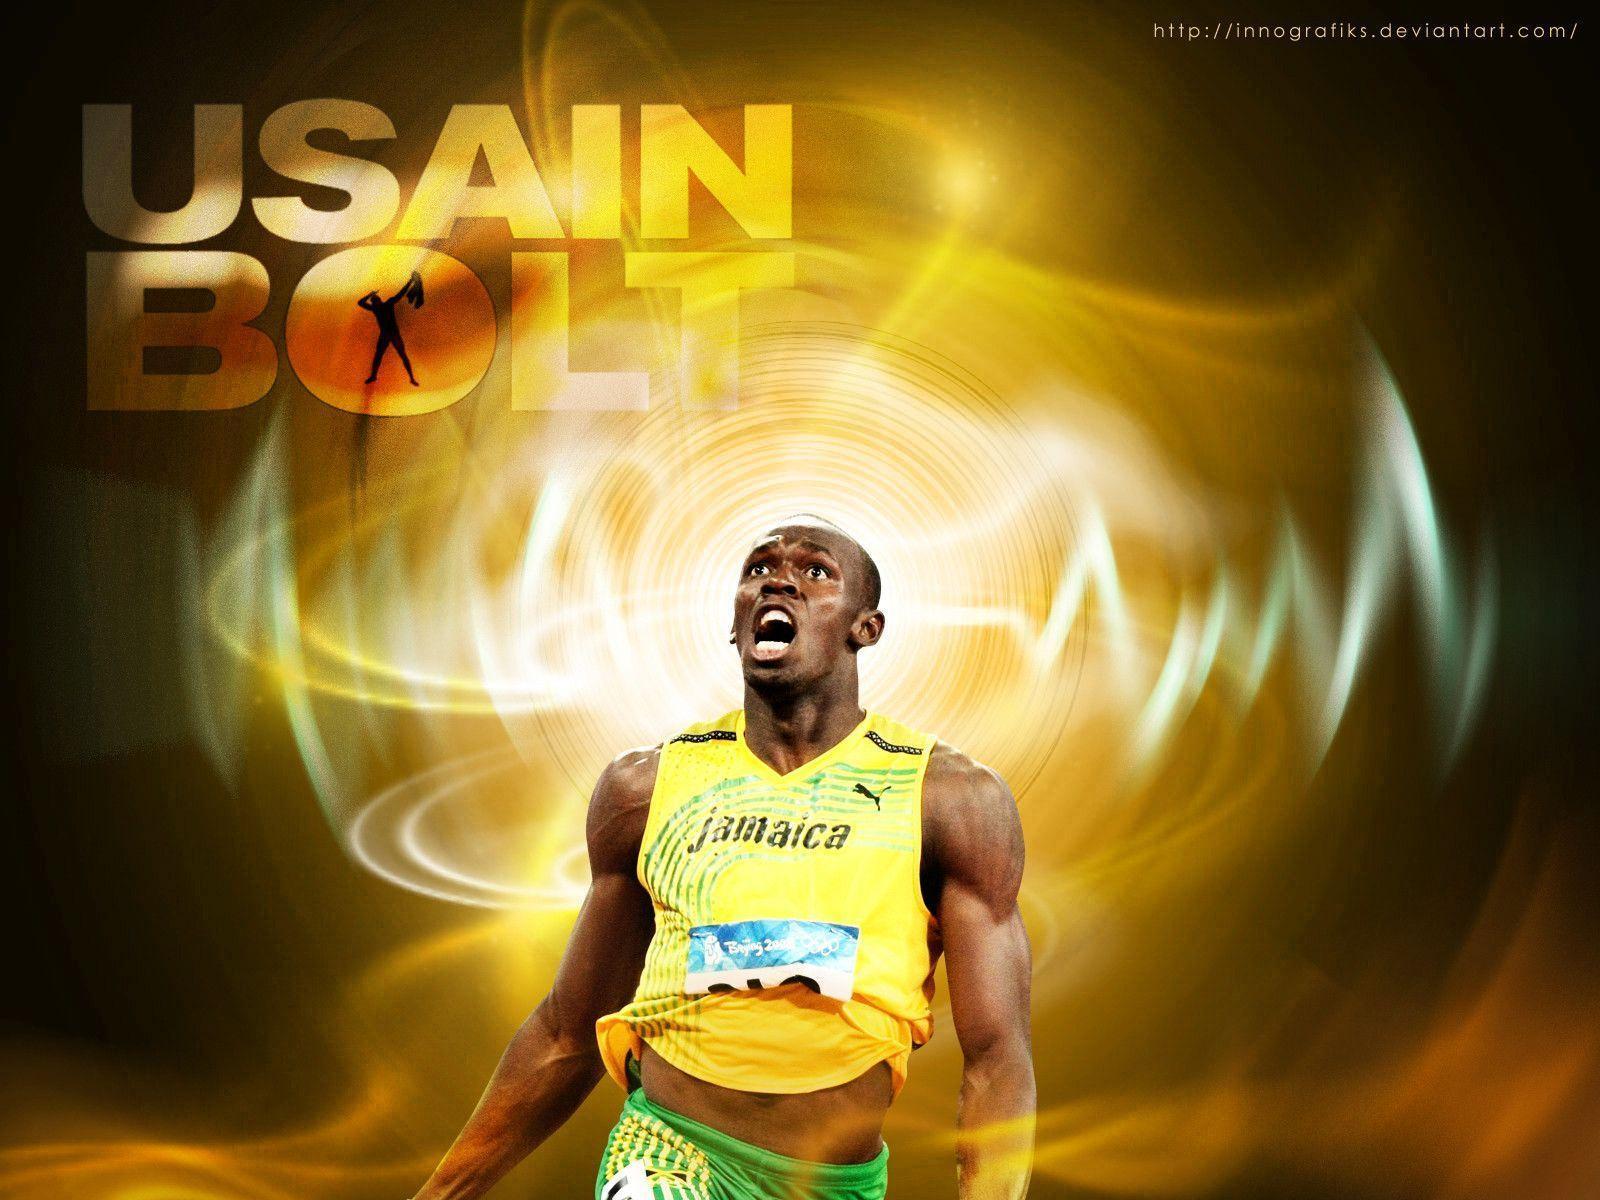 Images Usain Bolt Wallpaper | maswallpaper.